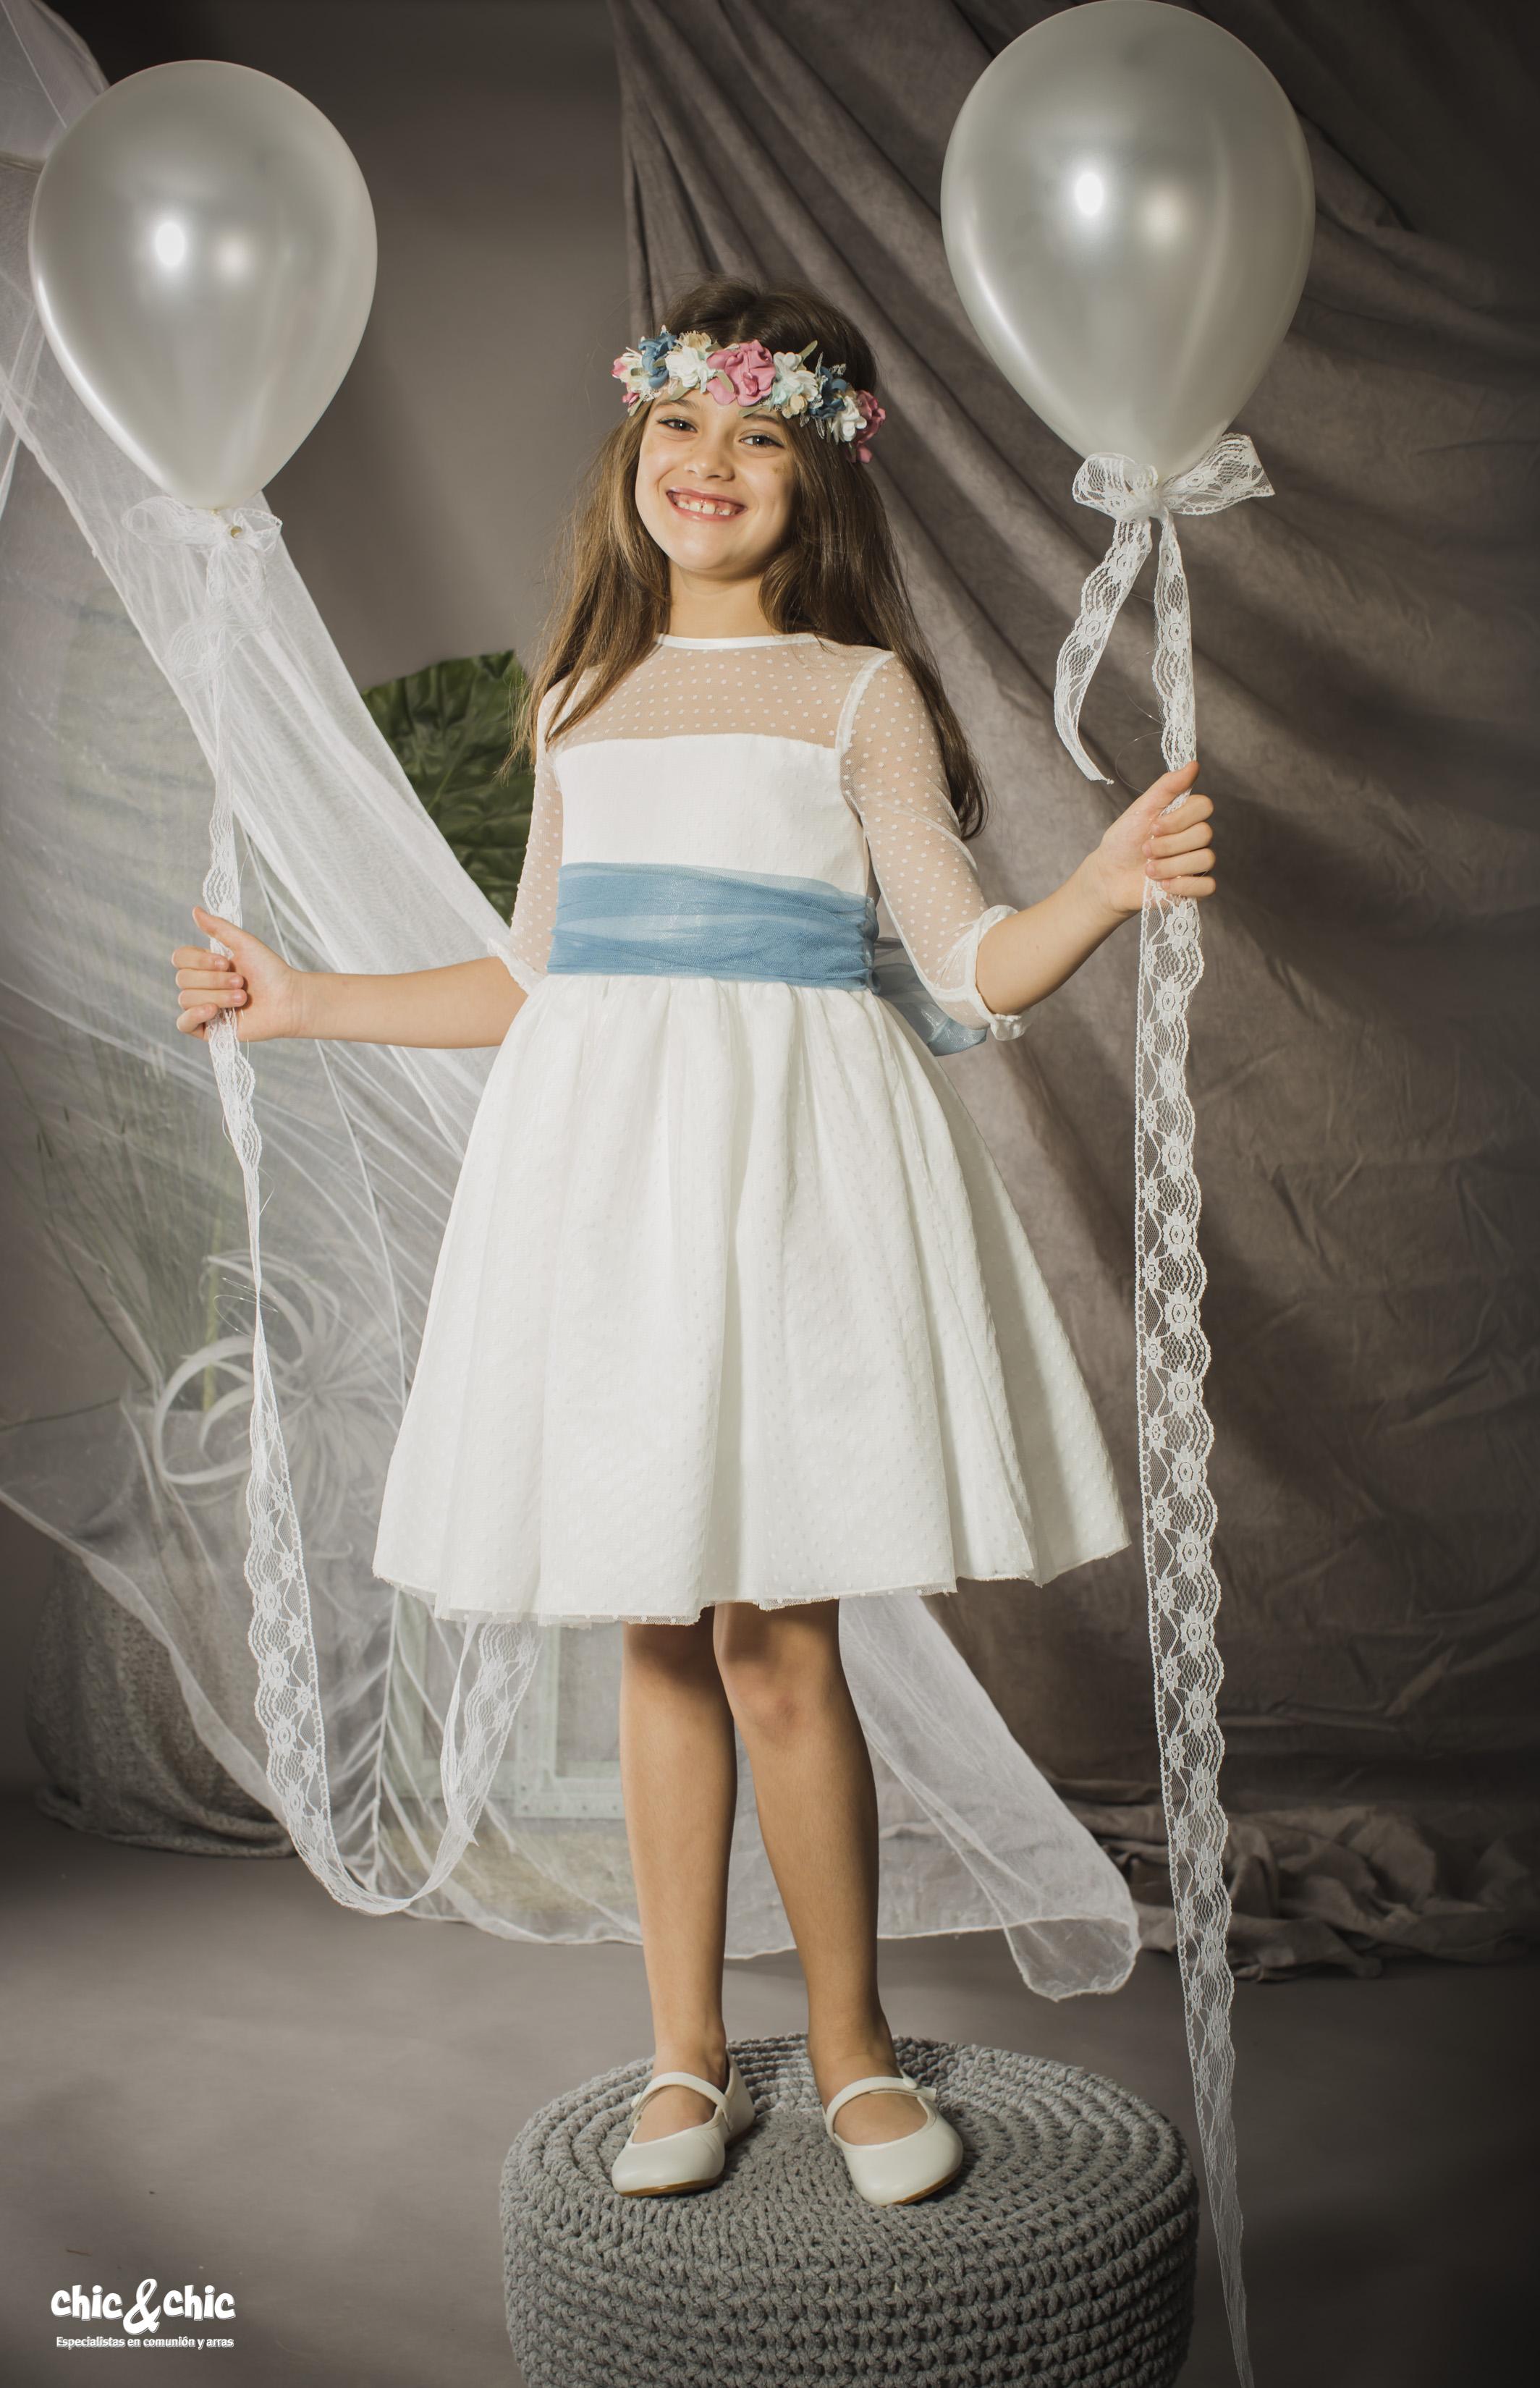 29dcc71f1 Vestido tul plumeti Alaya (1-14 Años). Blanco roto - chic chic